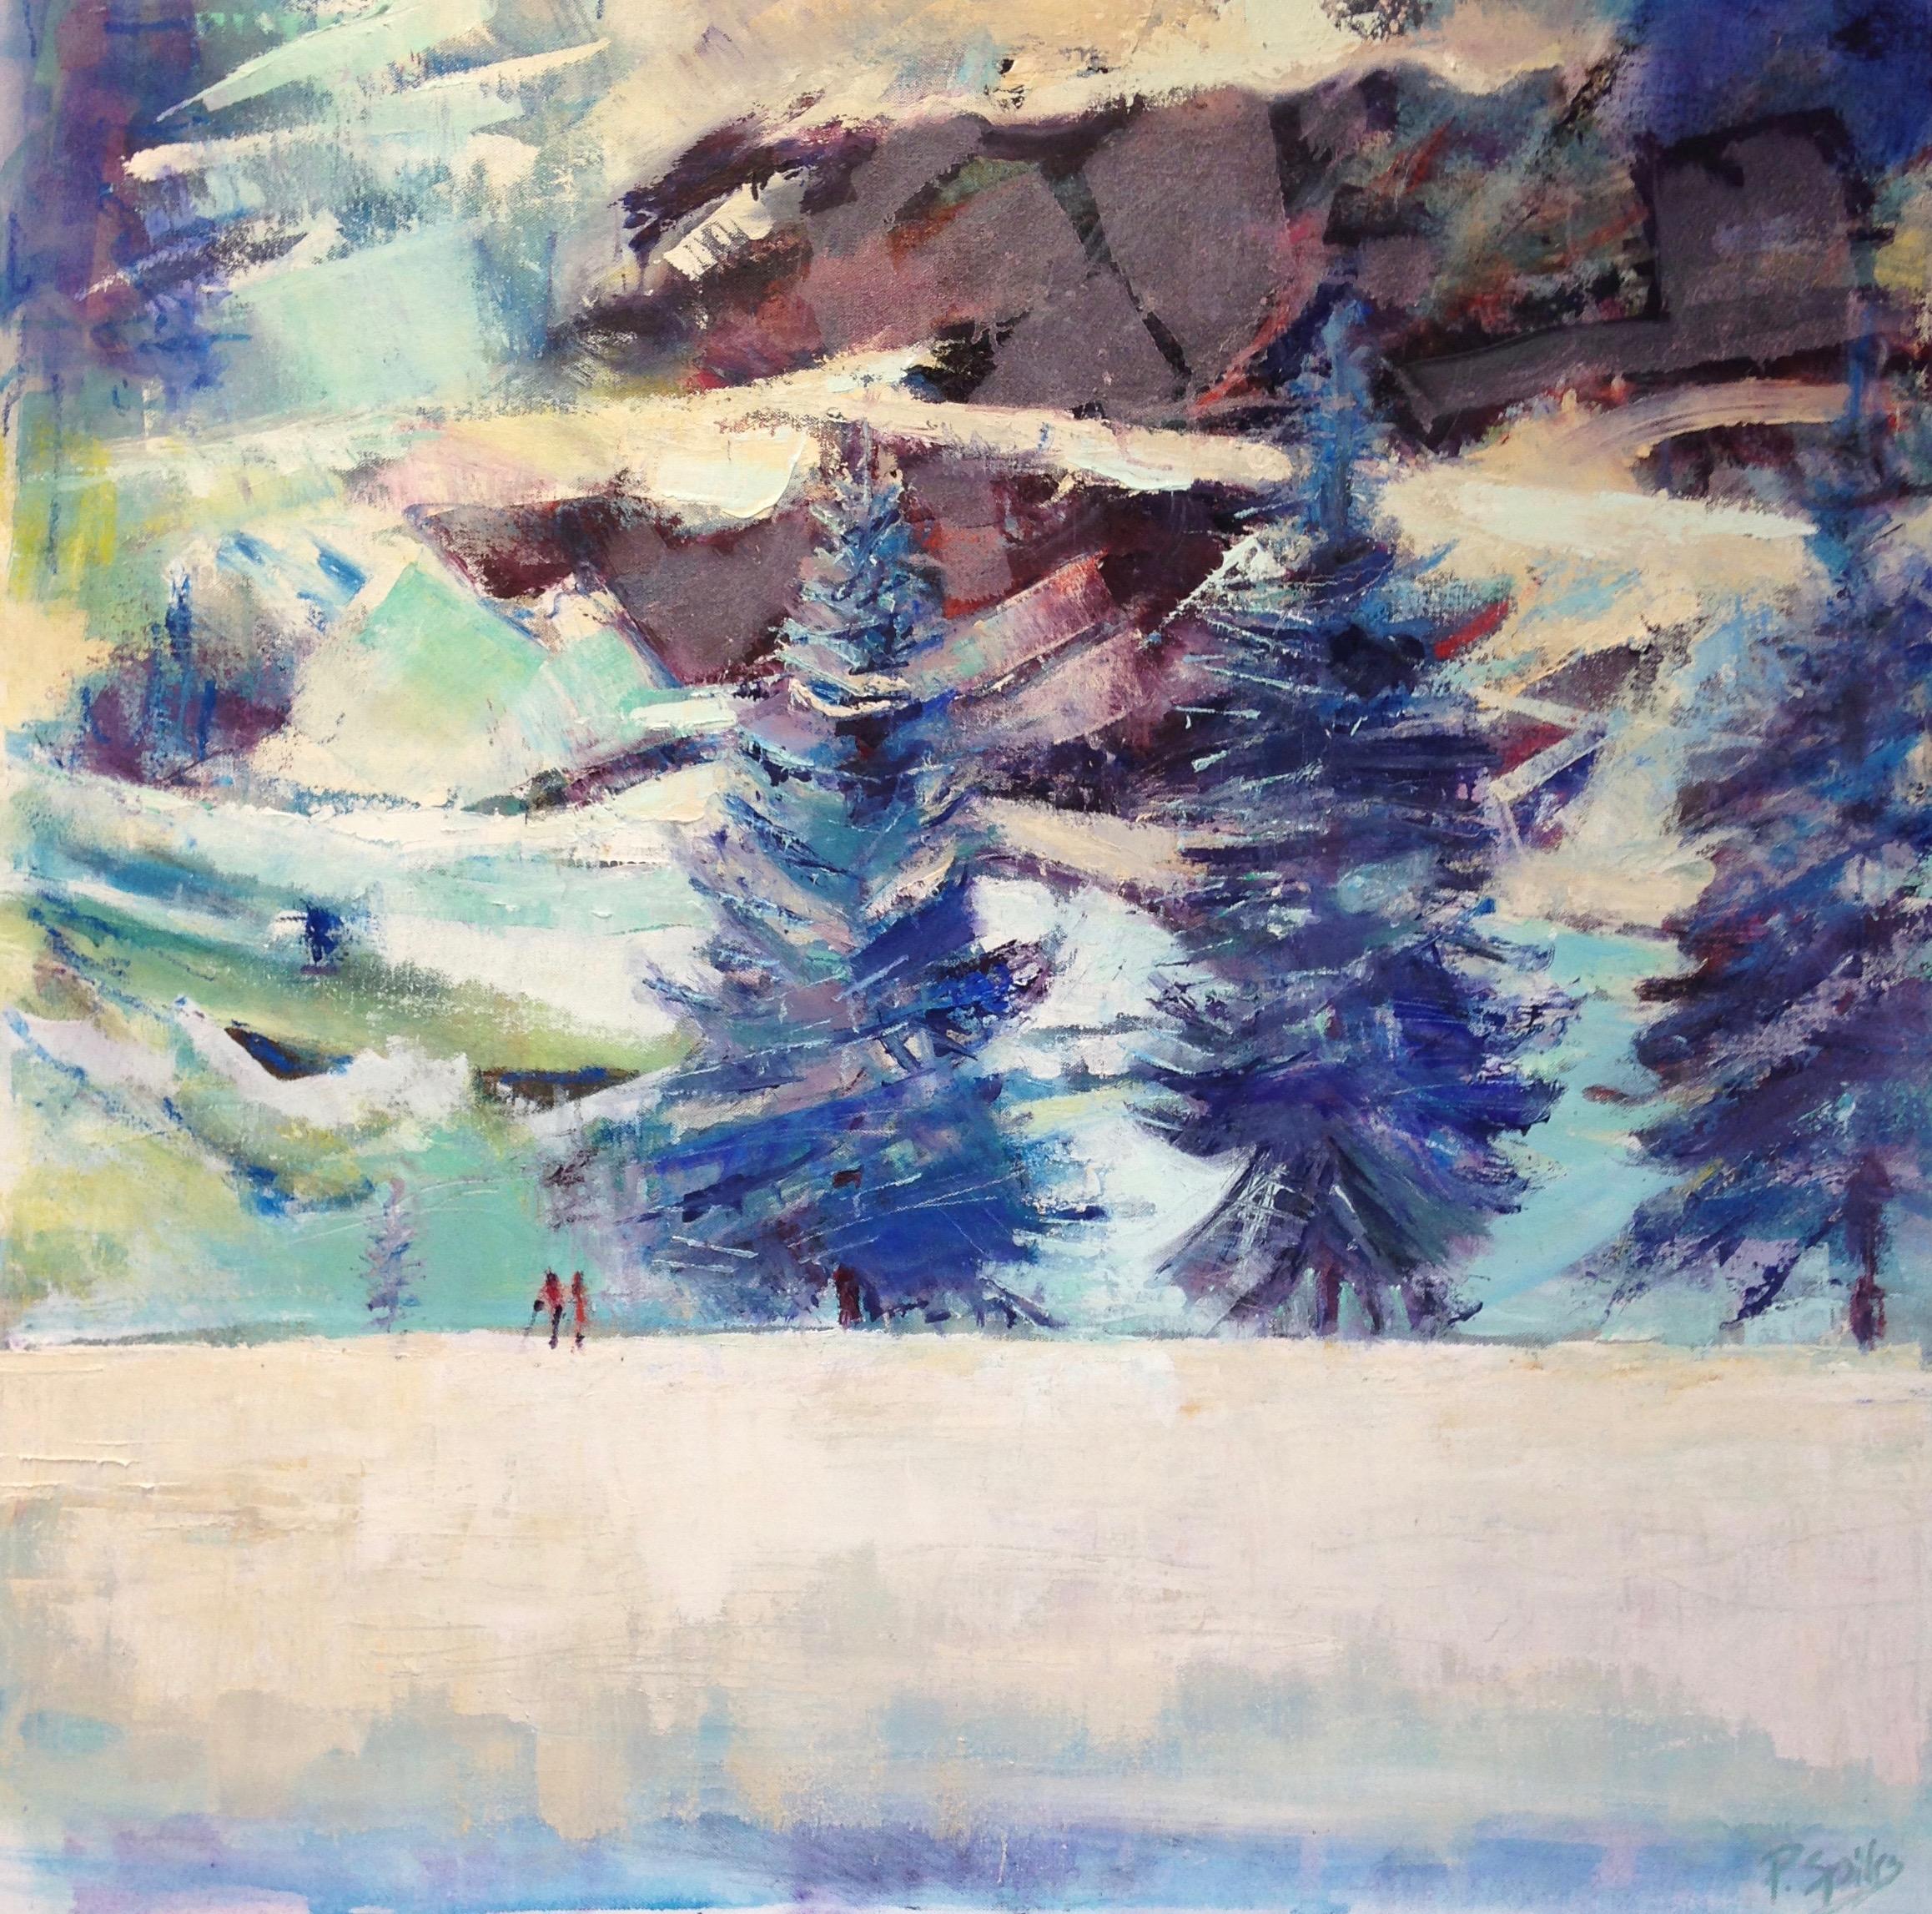 Promenade en hiver Pippa Spiers 90 x 90cm, oil on canvas